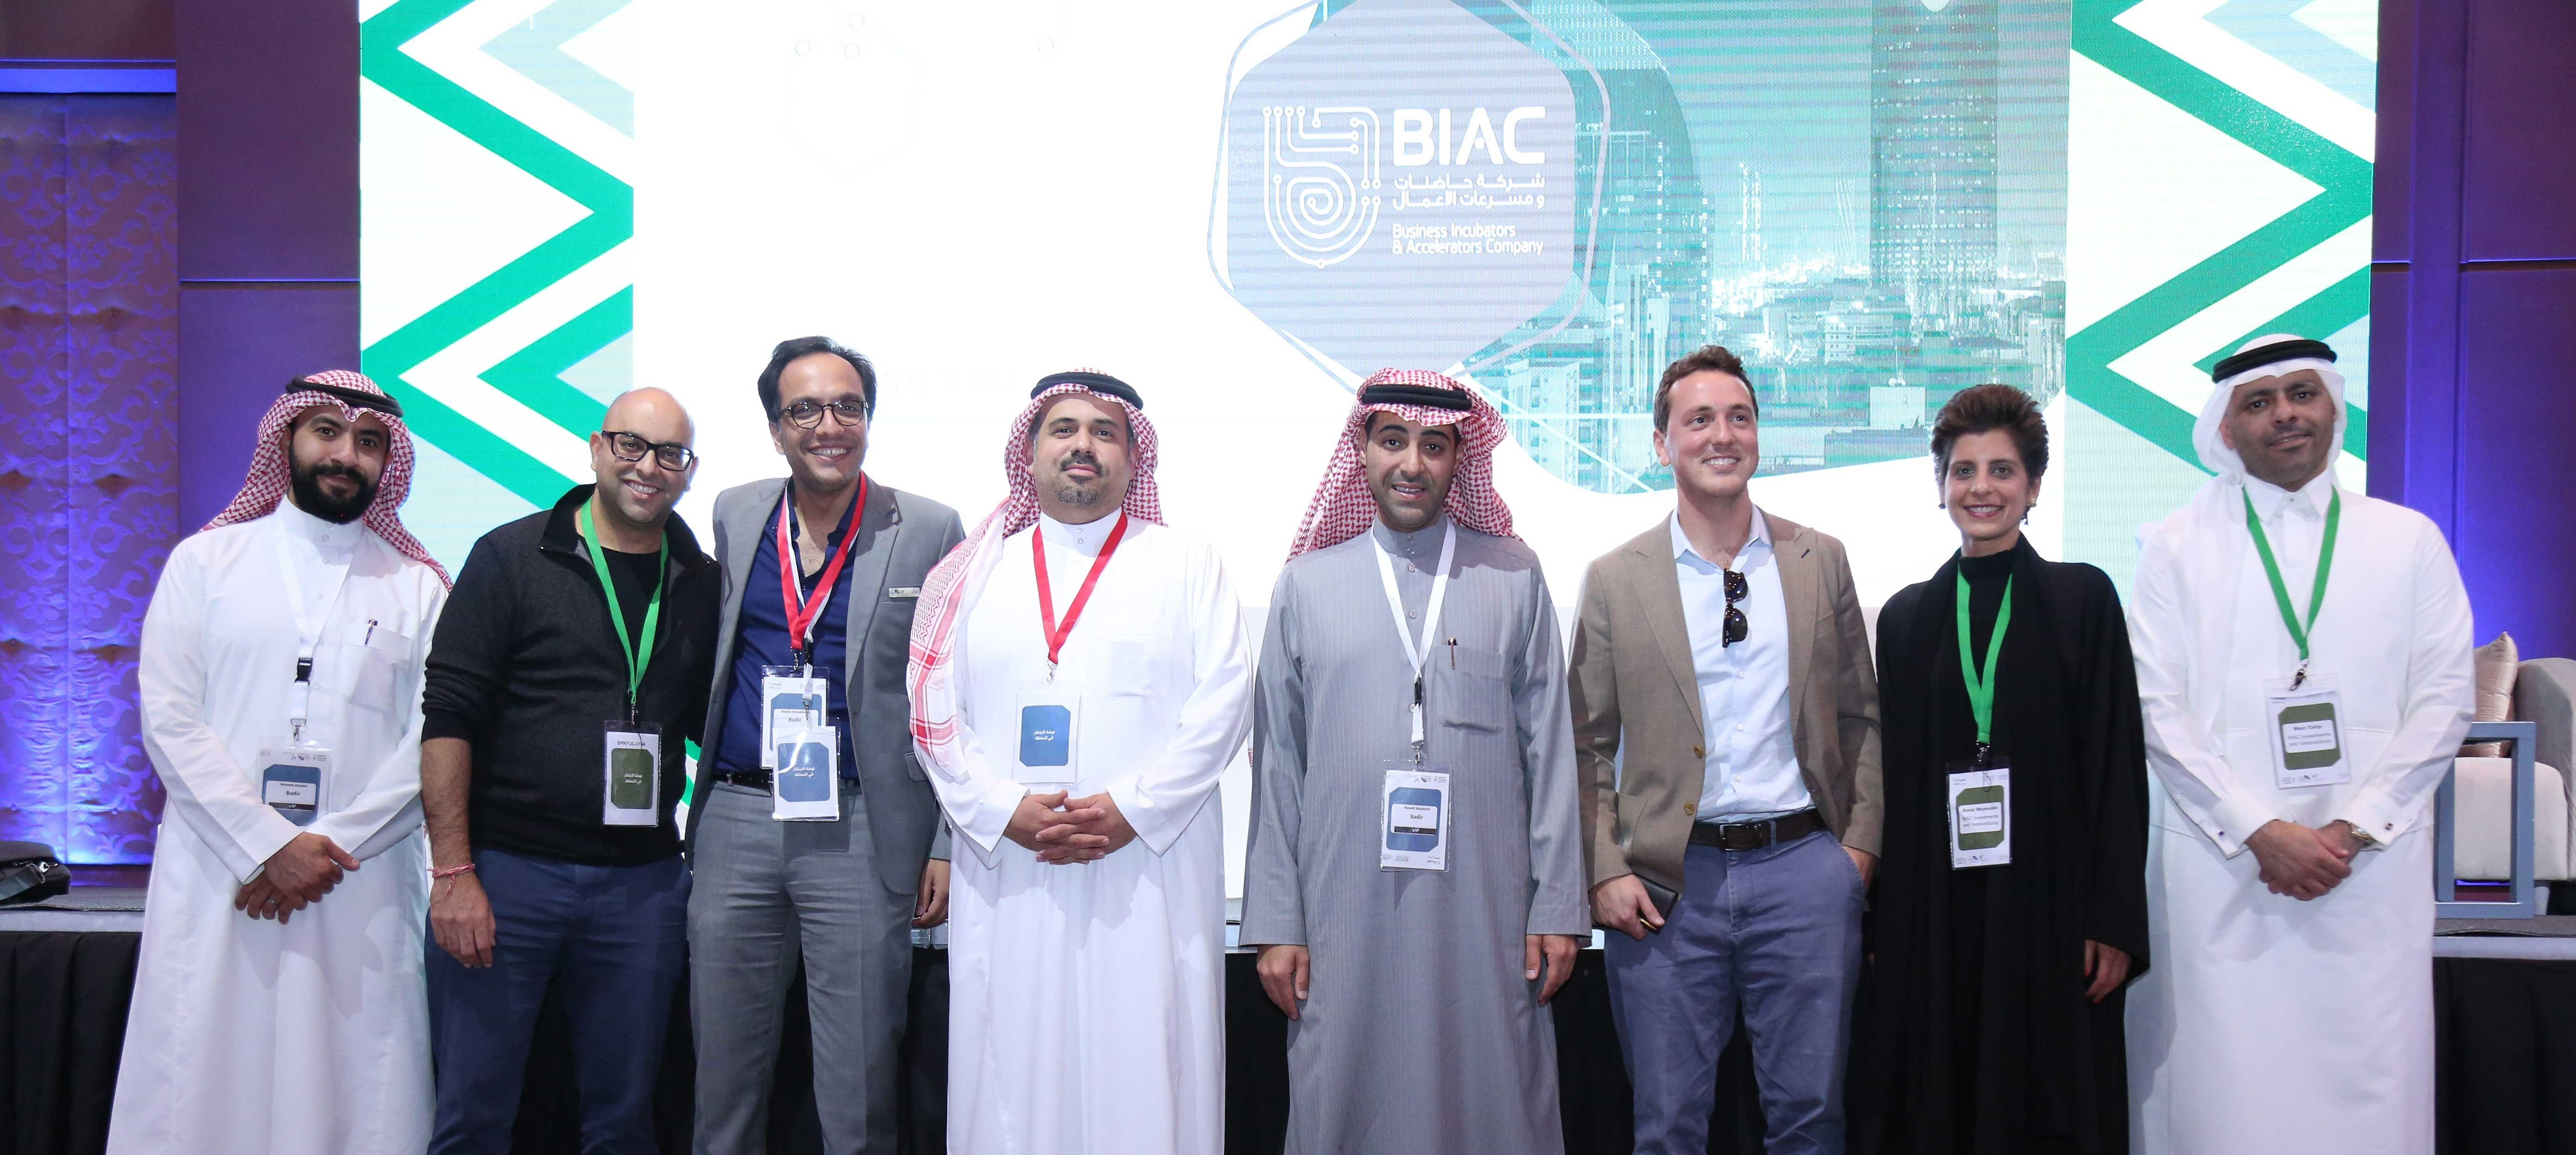 Saudi's BIAC tries to bridge funding gap for startups